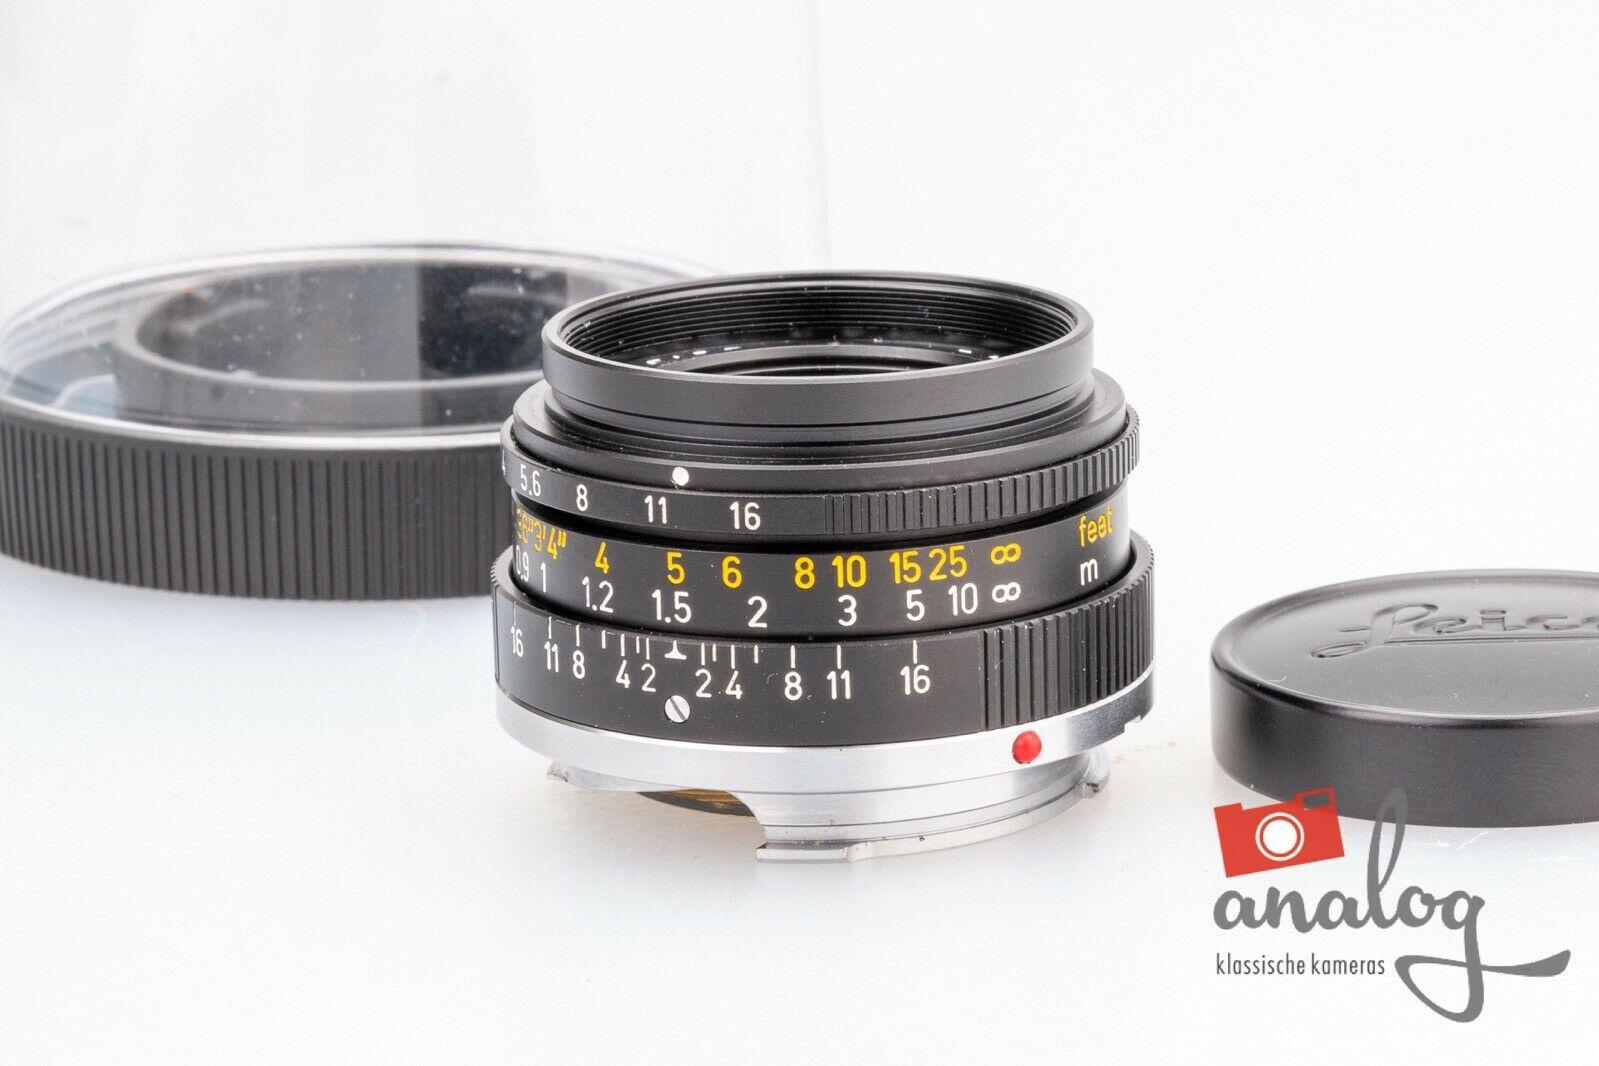 Leica Summicron 35mm - 11309 - III - werkstattüberholt